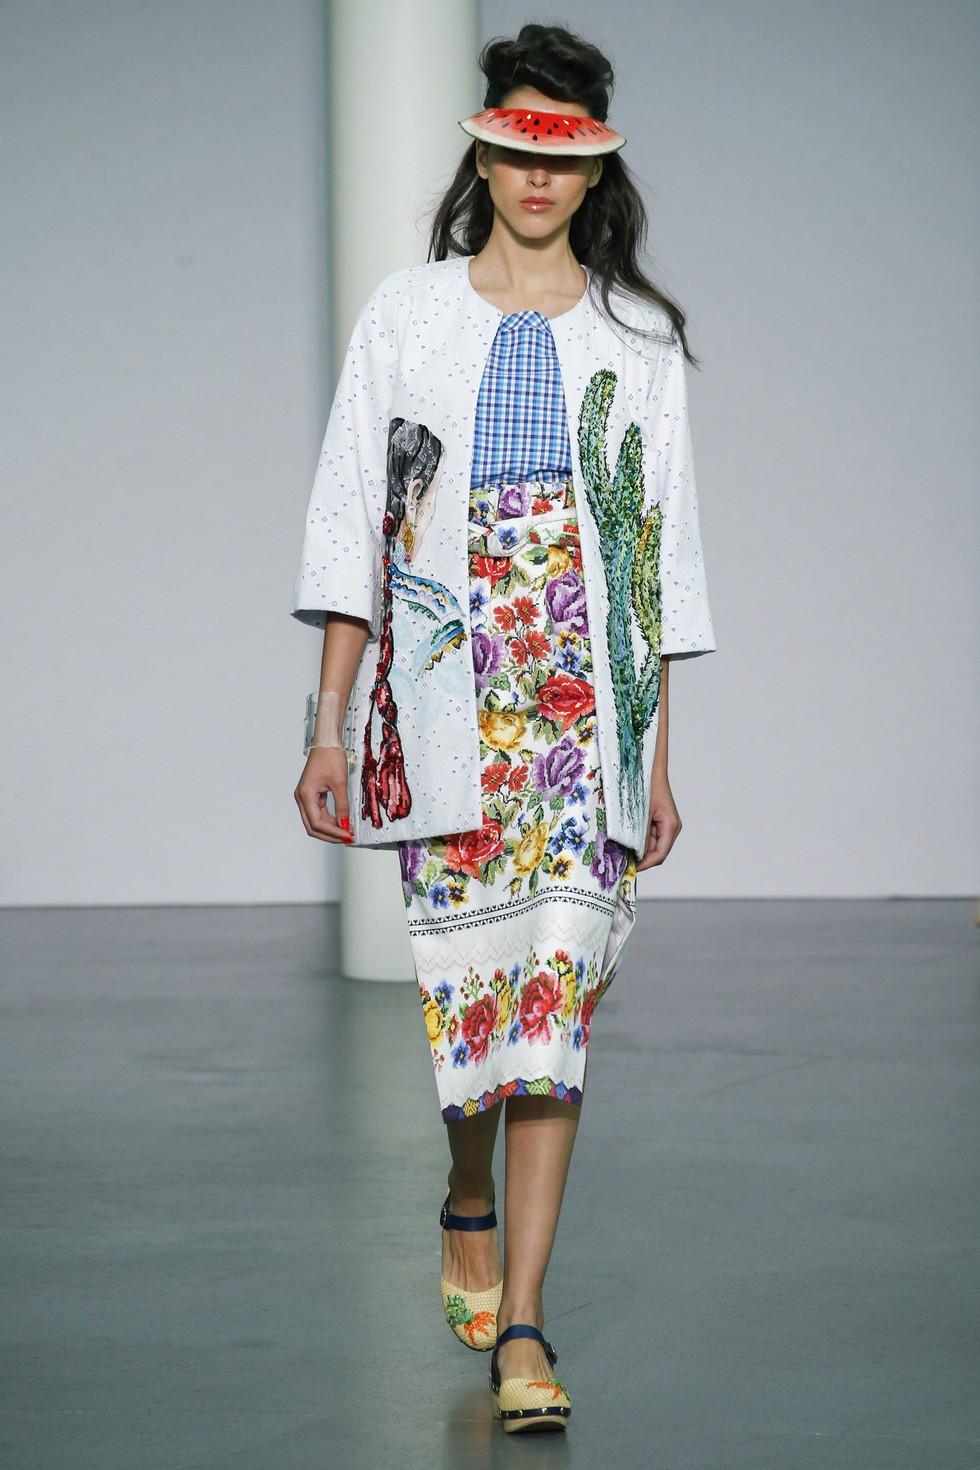 Milan Fashion Week 2016 Spring Summer News Day one best moments-Stella Jean